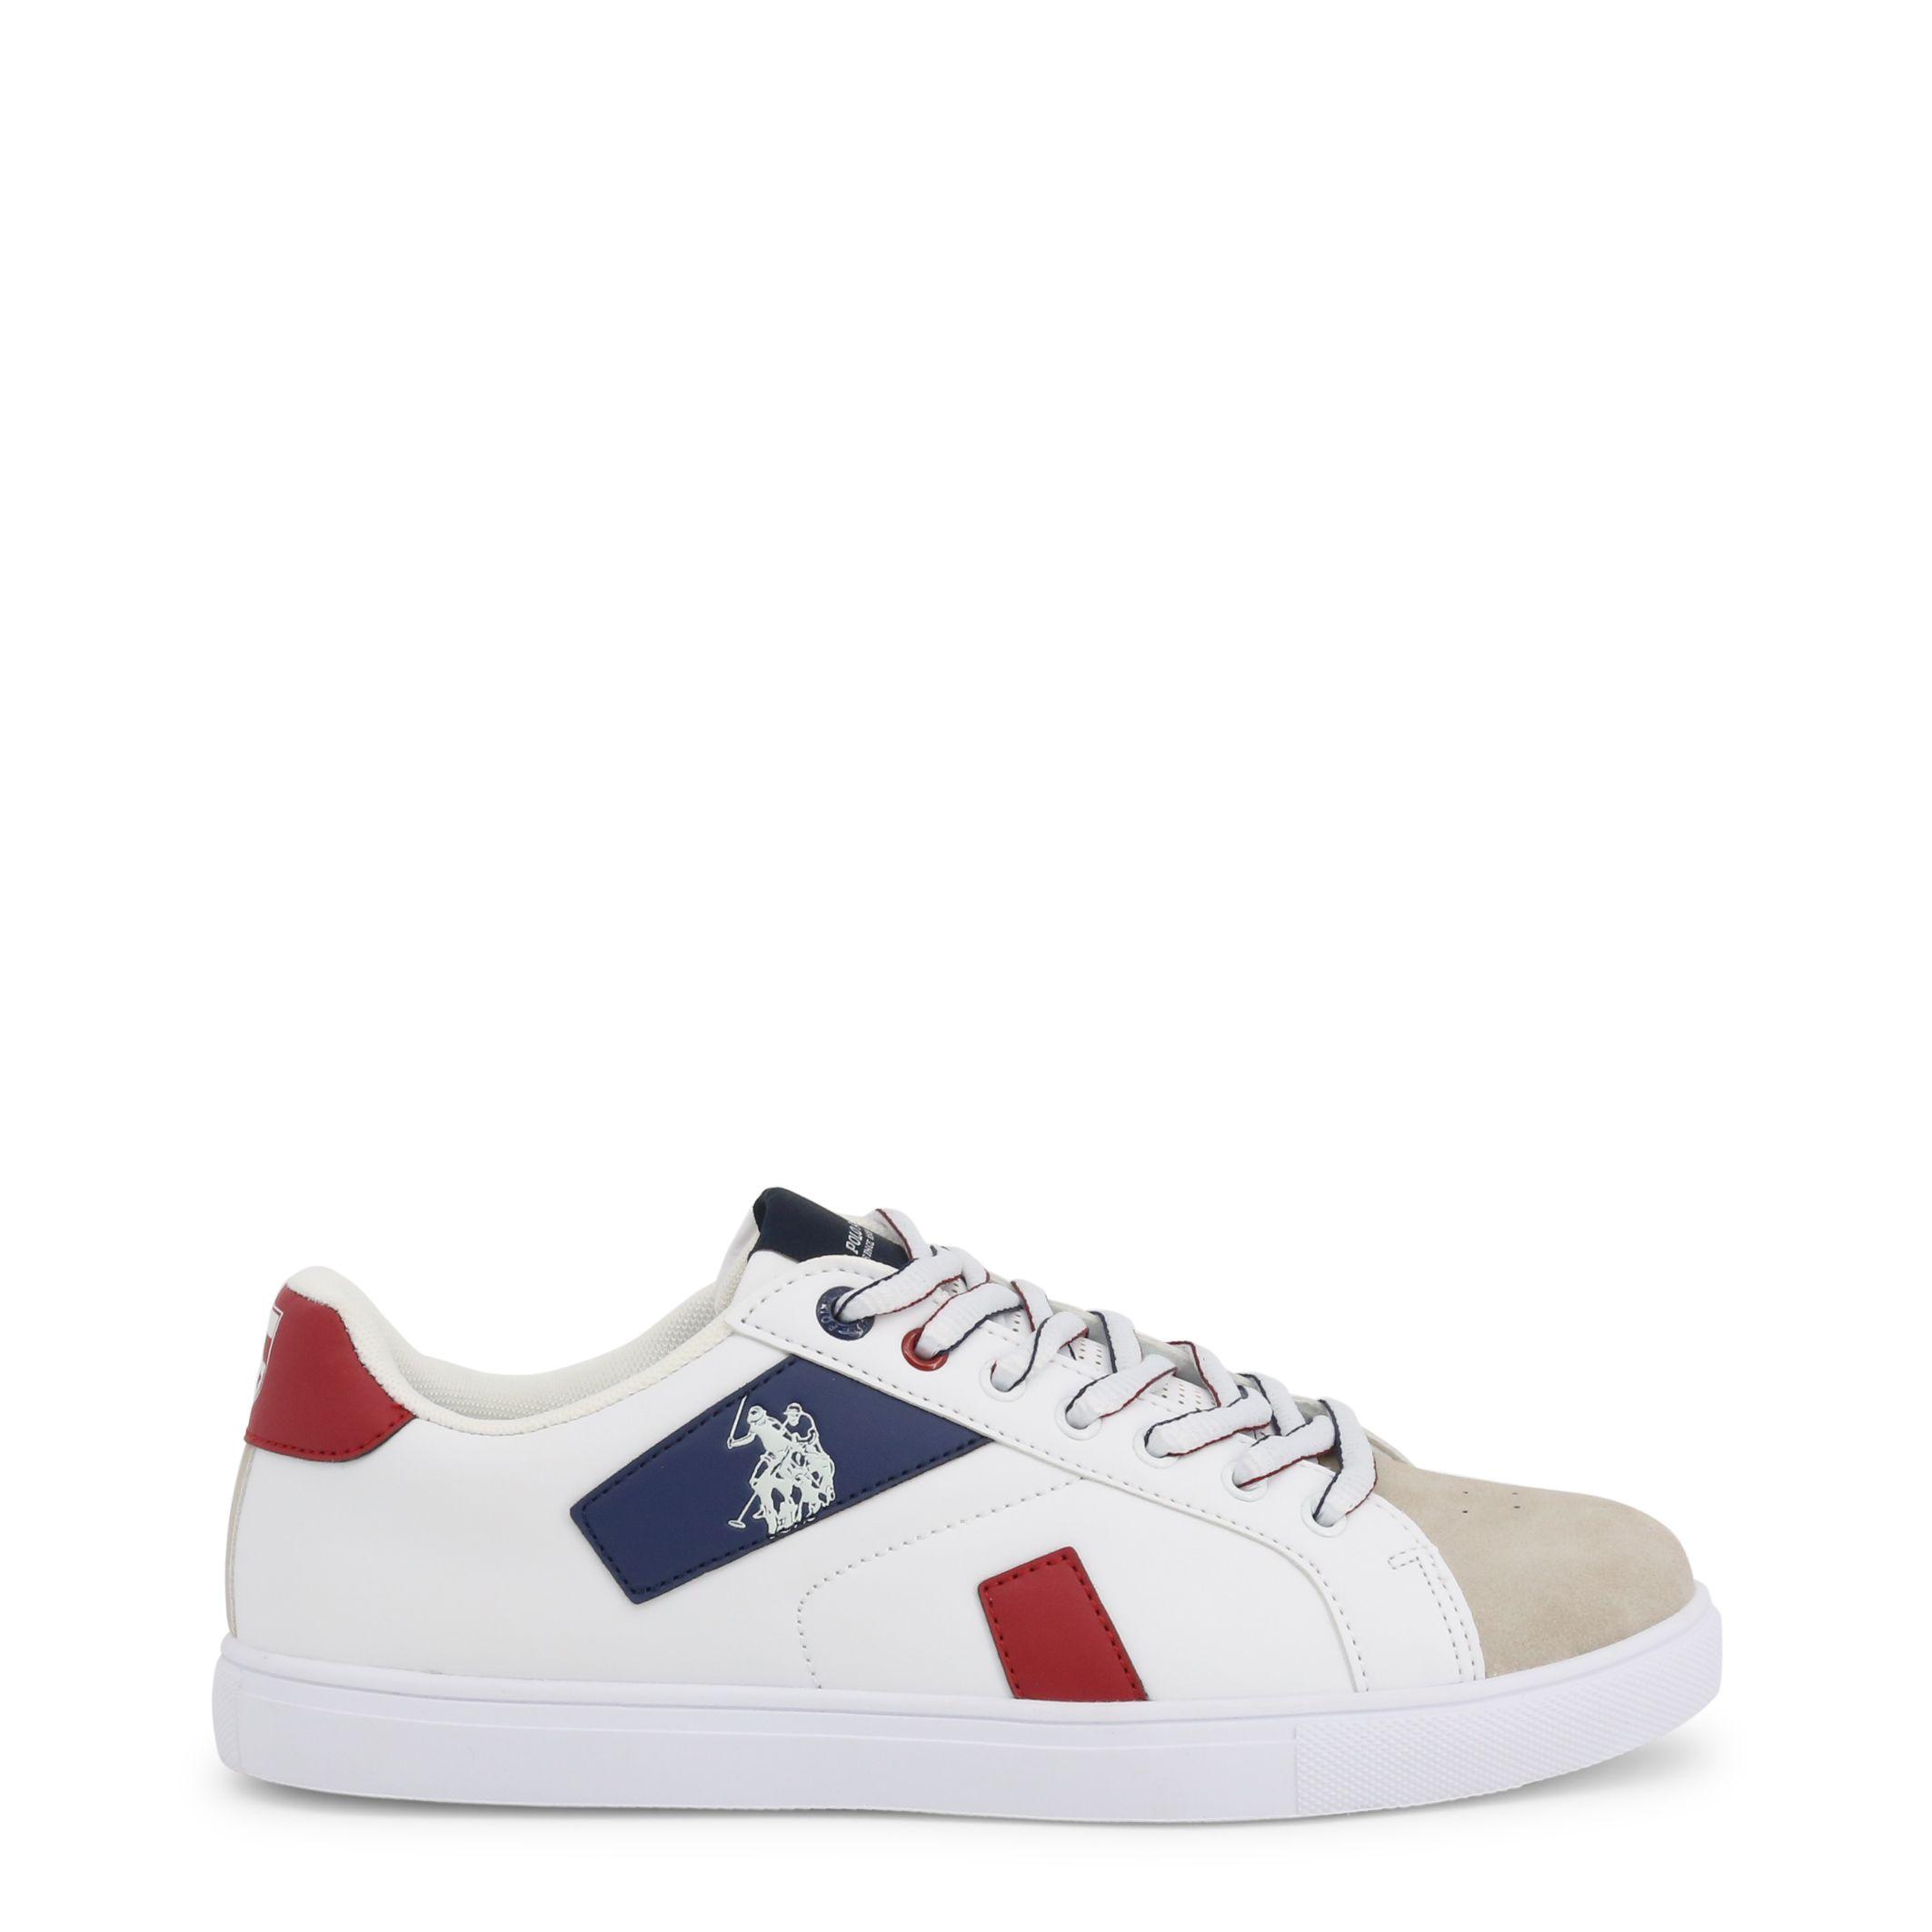 U.S. Polo Assn. Mens Sneakers